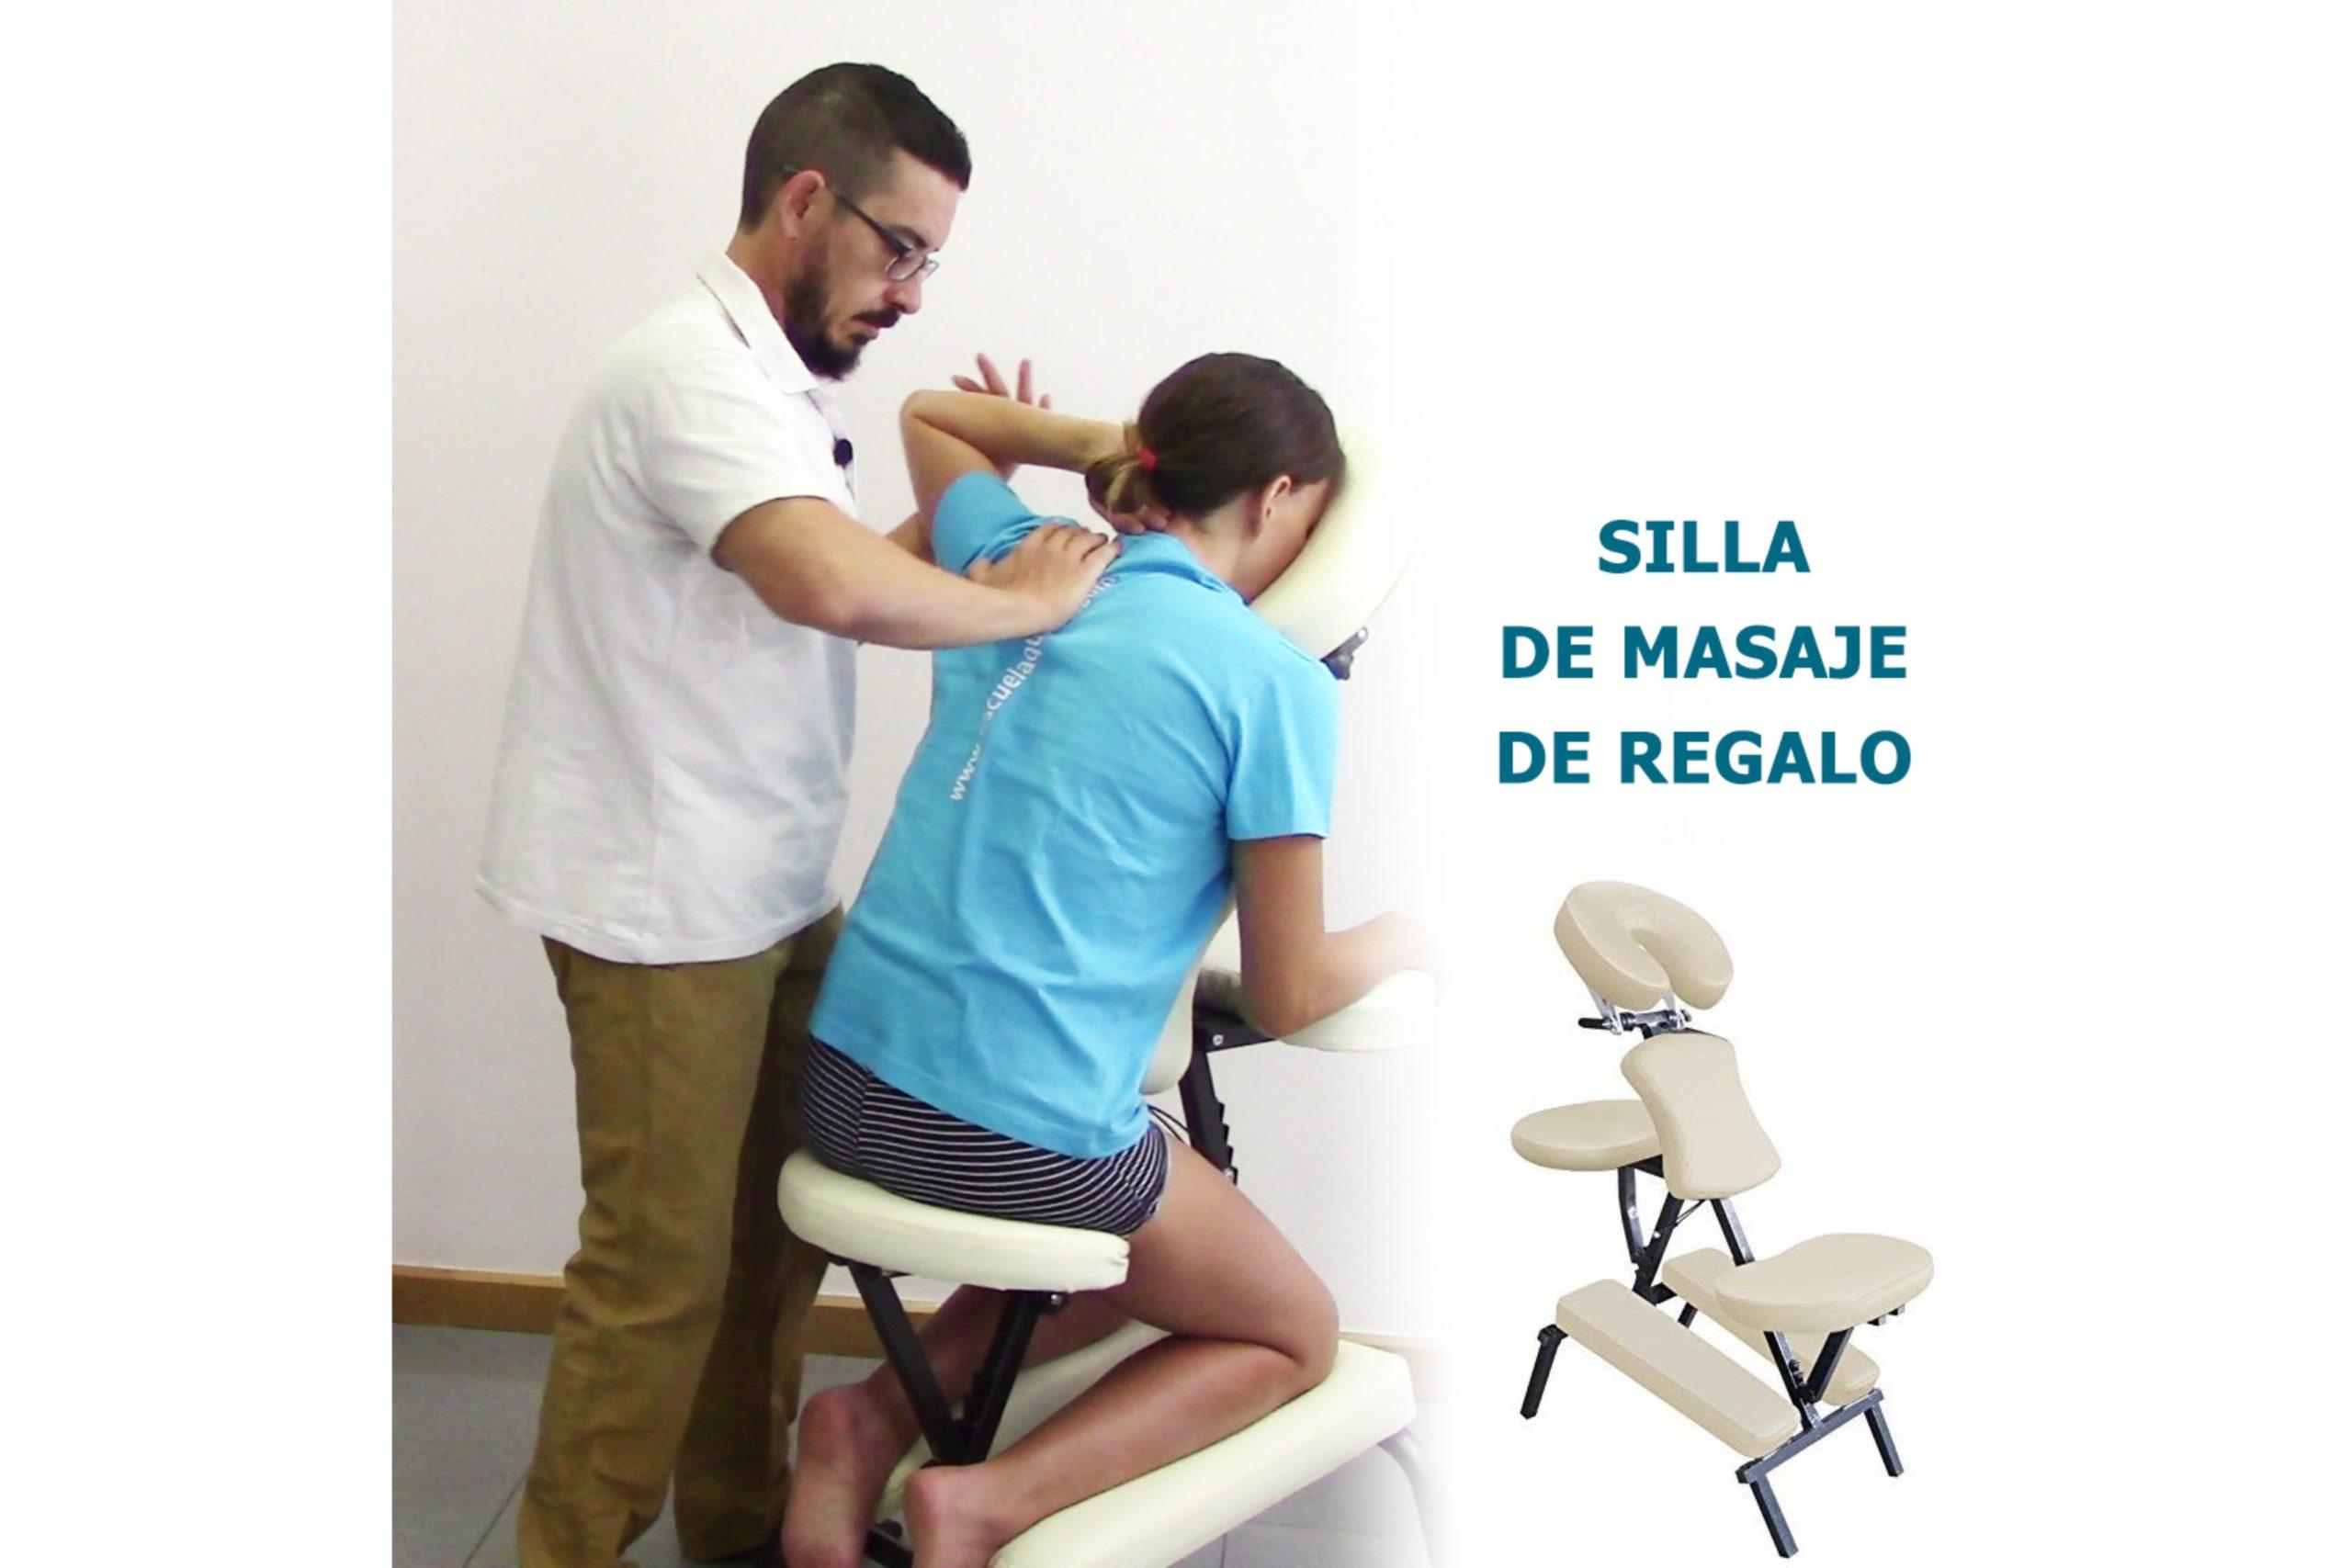 portada-SILLA-MASAJE-resized-scaled